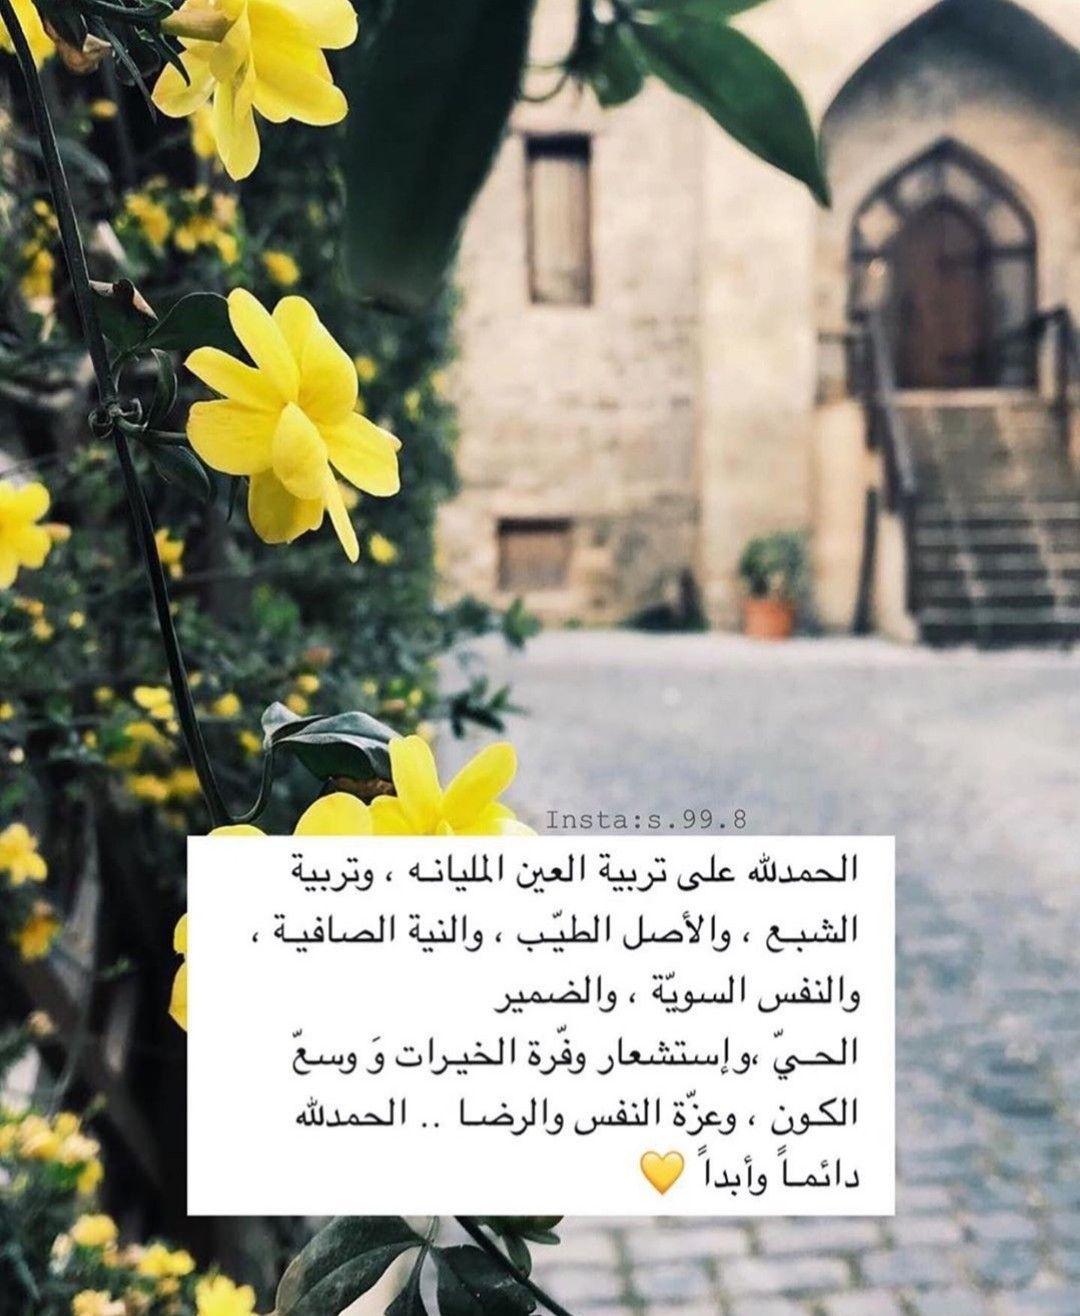 الحمدلله Arabic Quotes Beautiful Arabic Words Islamic Quotes Wallpaper